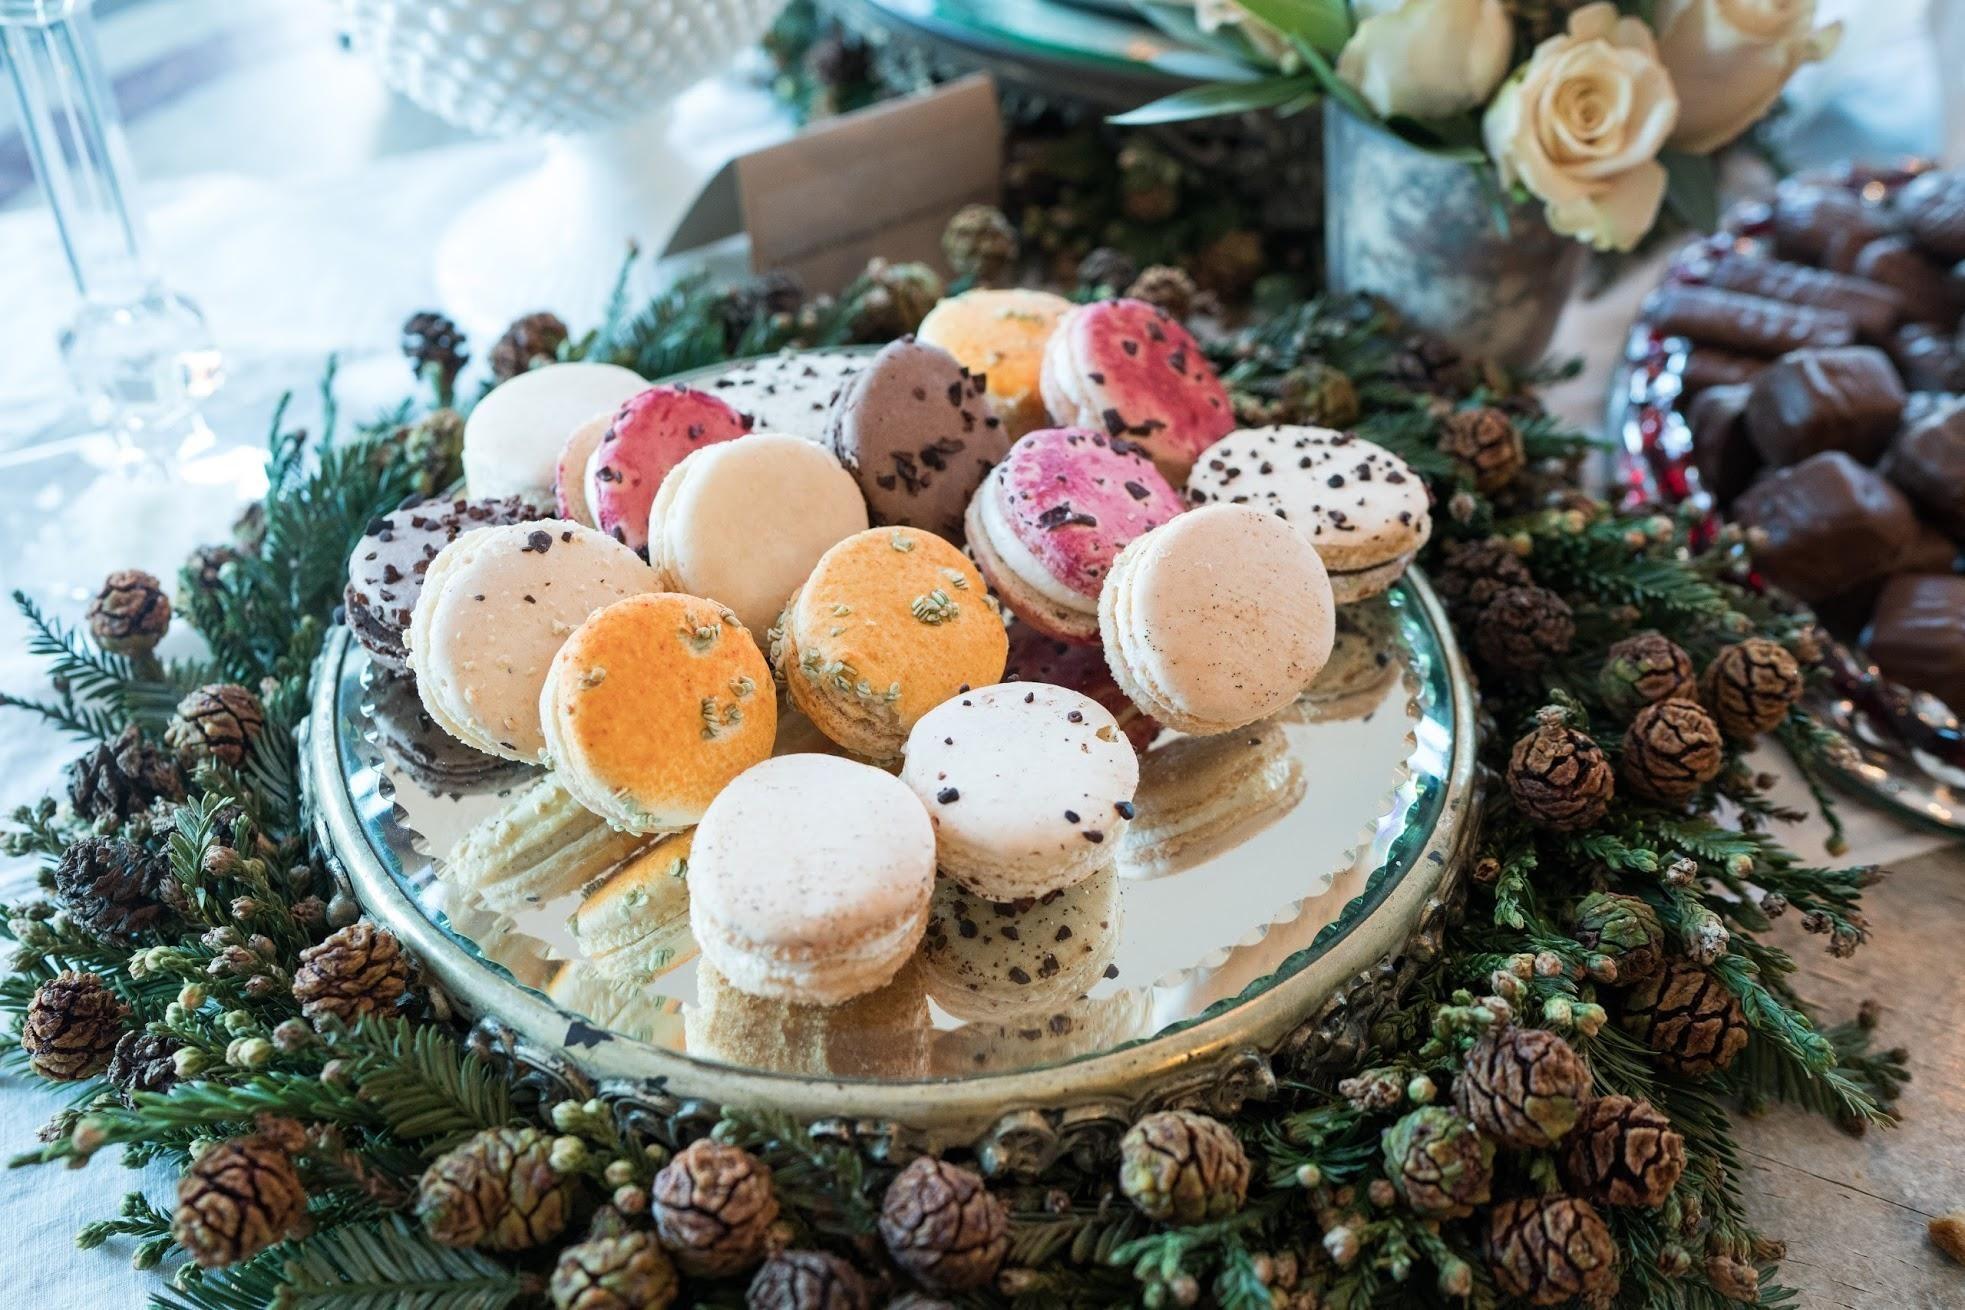 Holiday Macarons [OC] [1965x1310] via Classy Bro